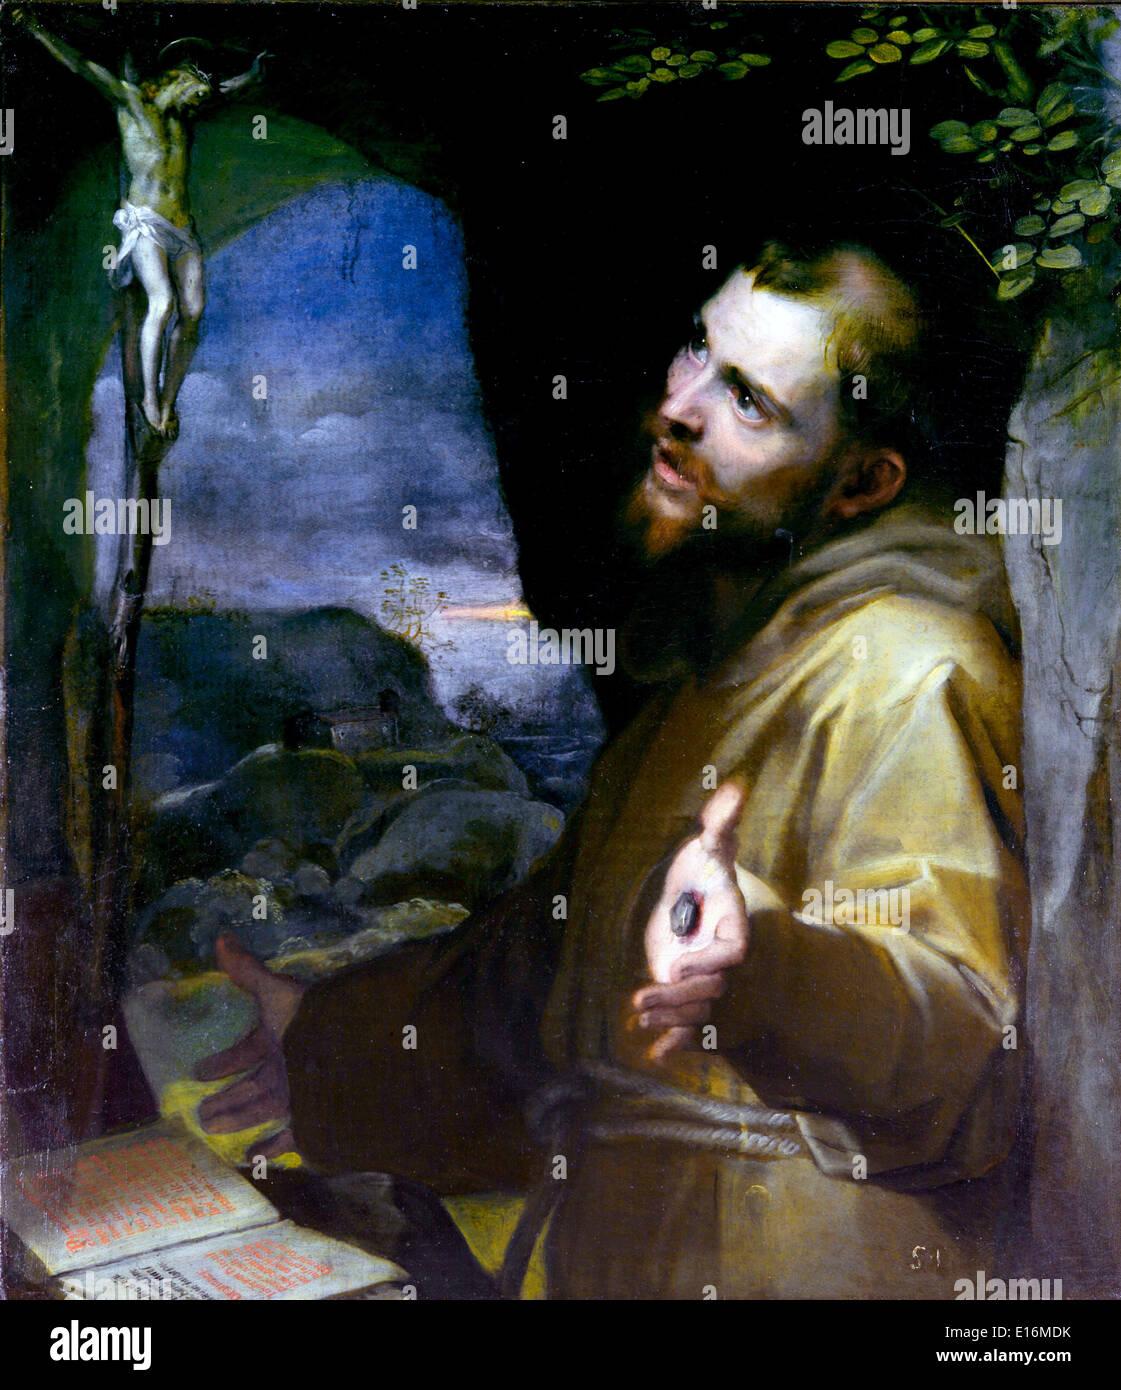 Saint Francis by Federico Barocci - Stock Image